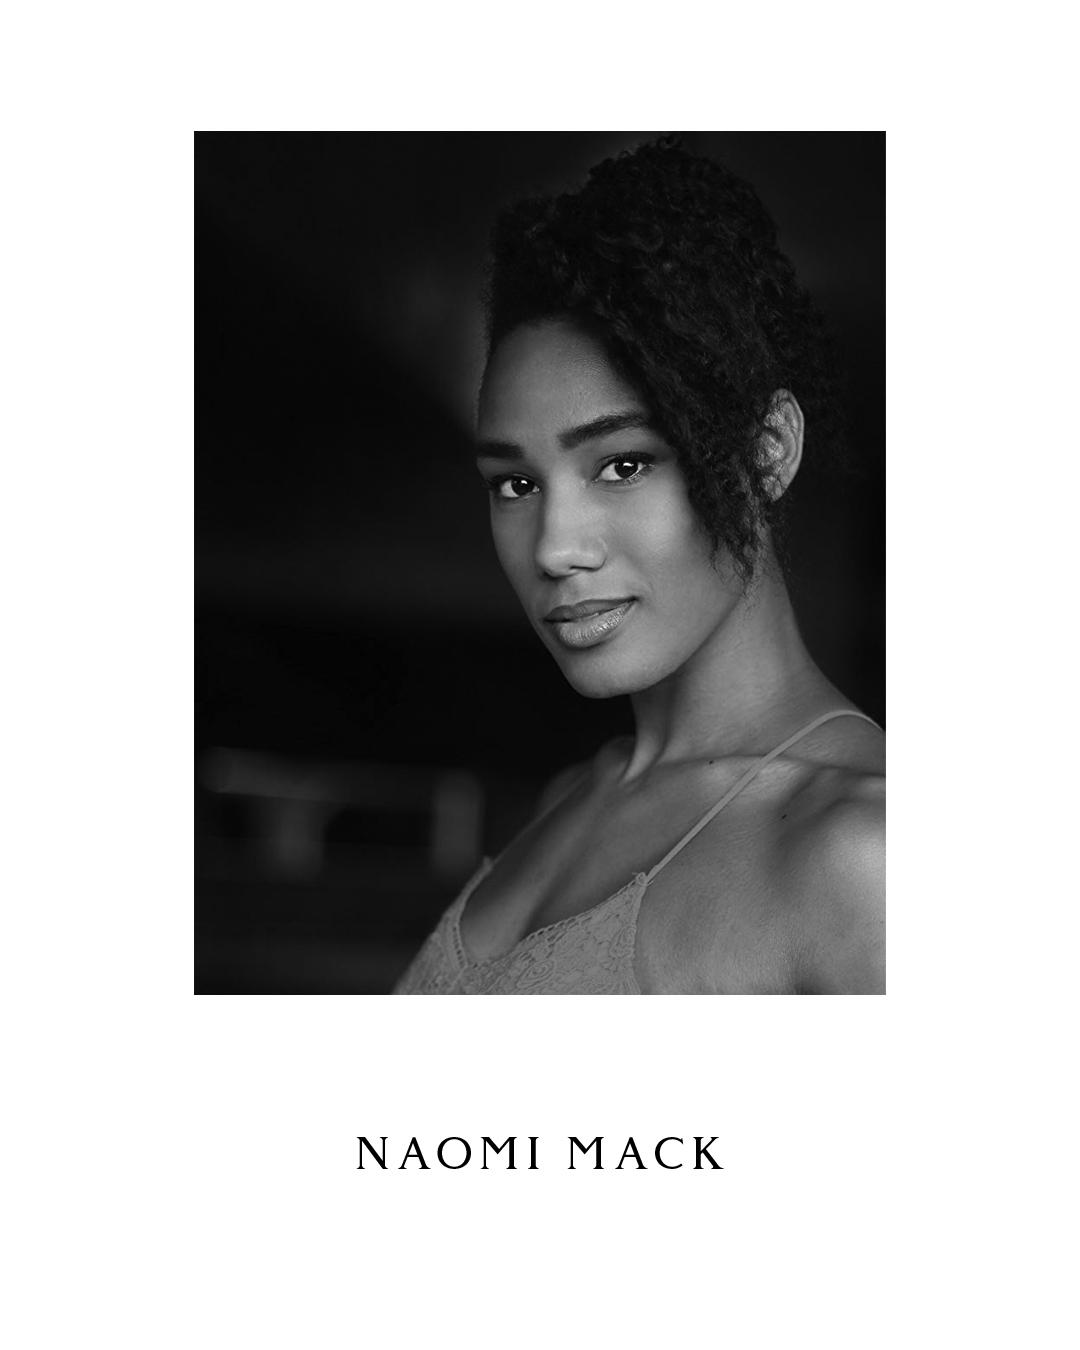 Naomi Mack - Assistant Director